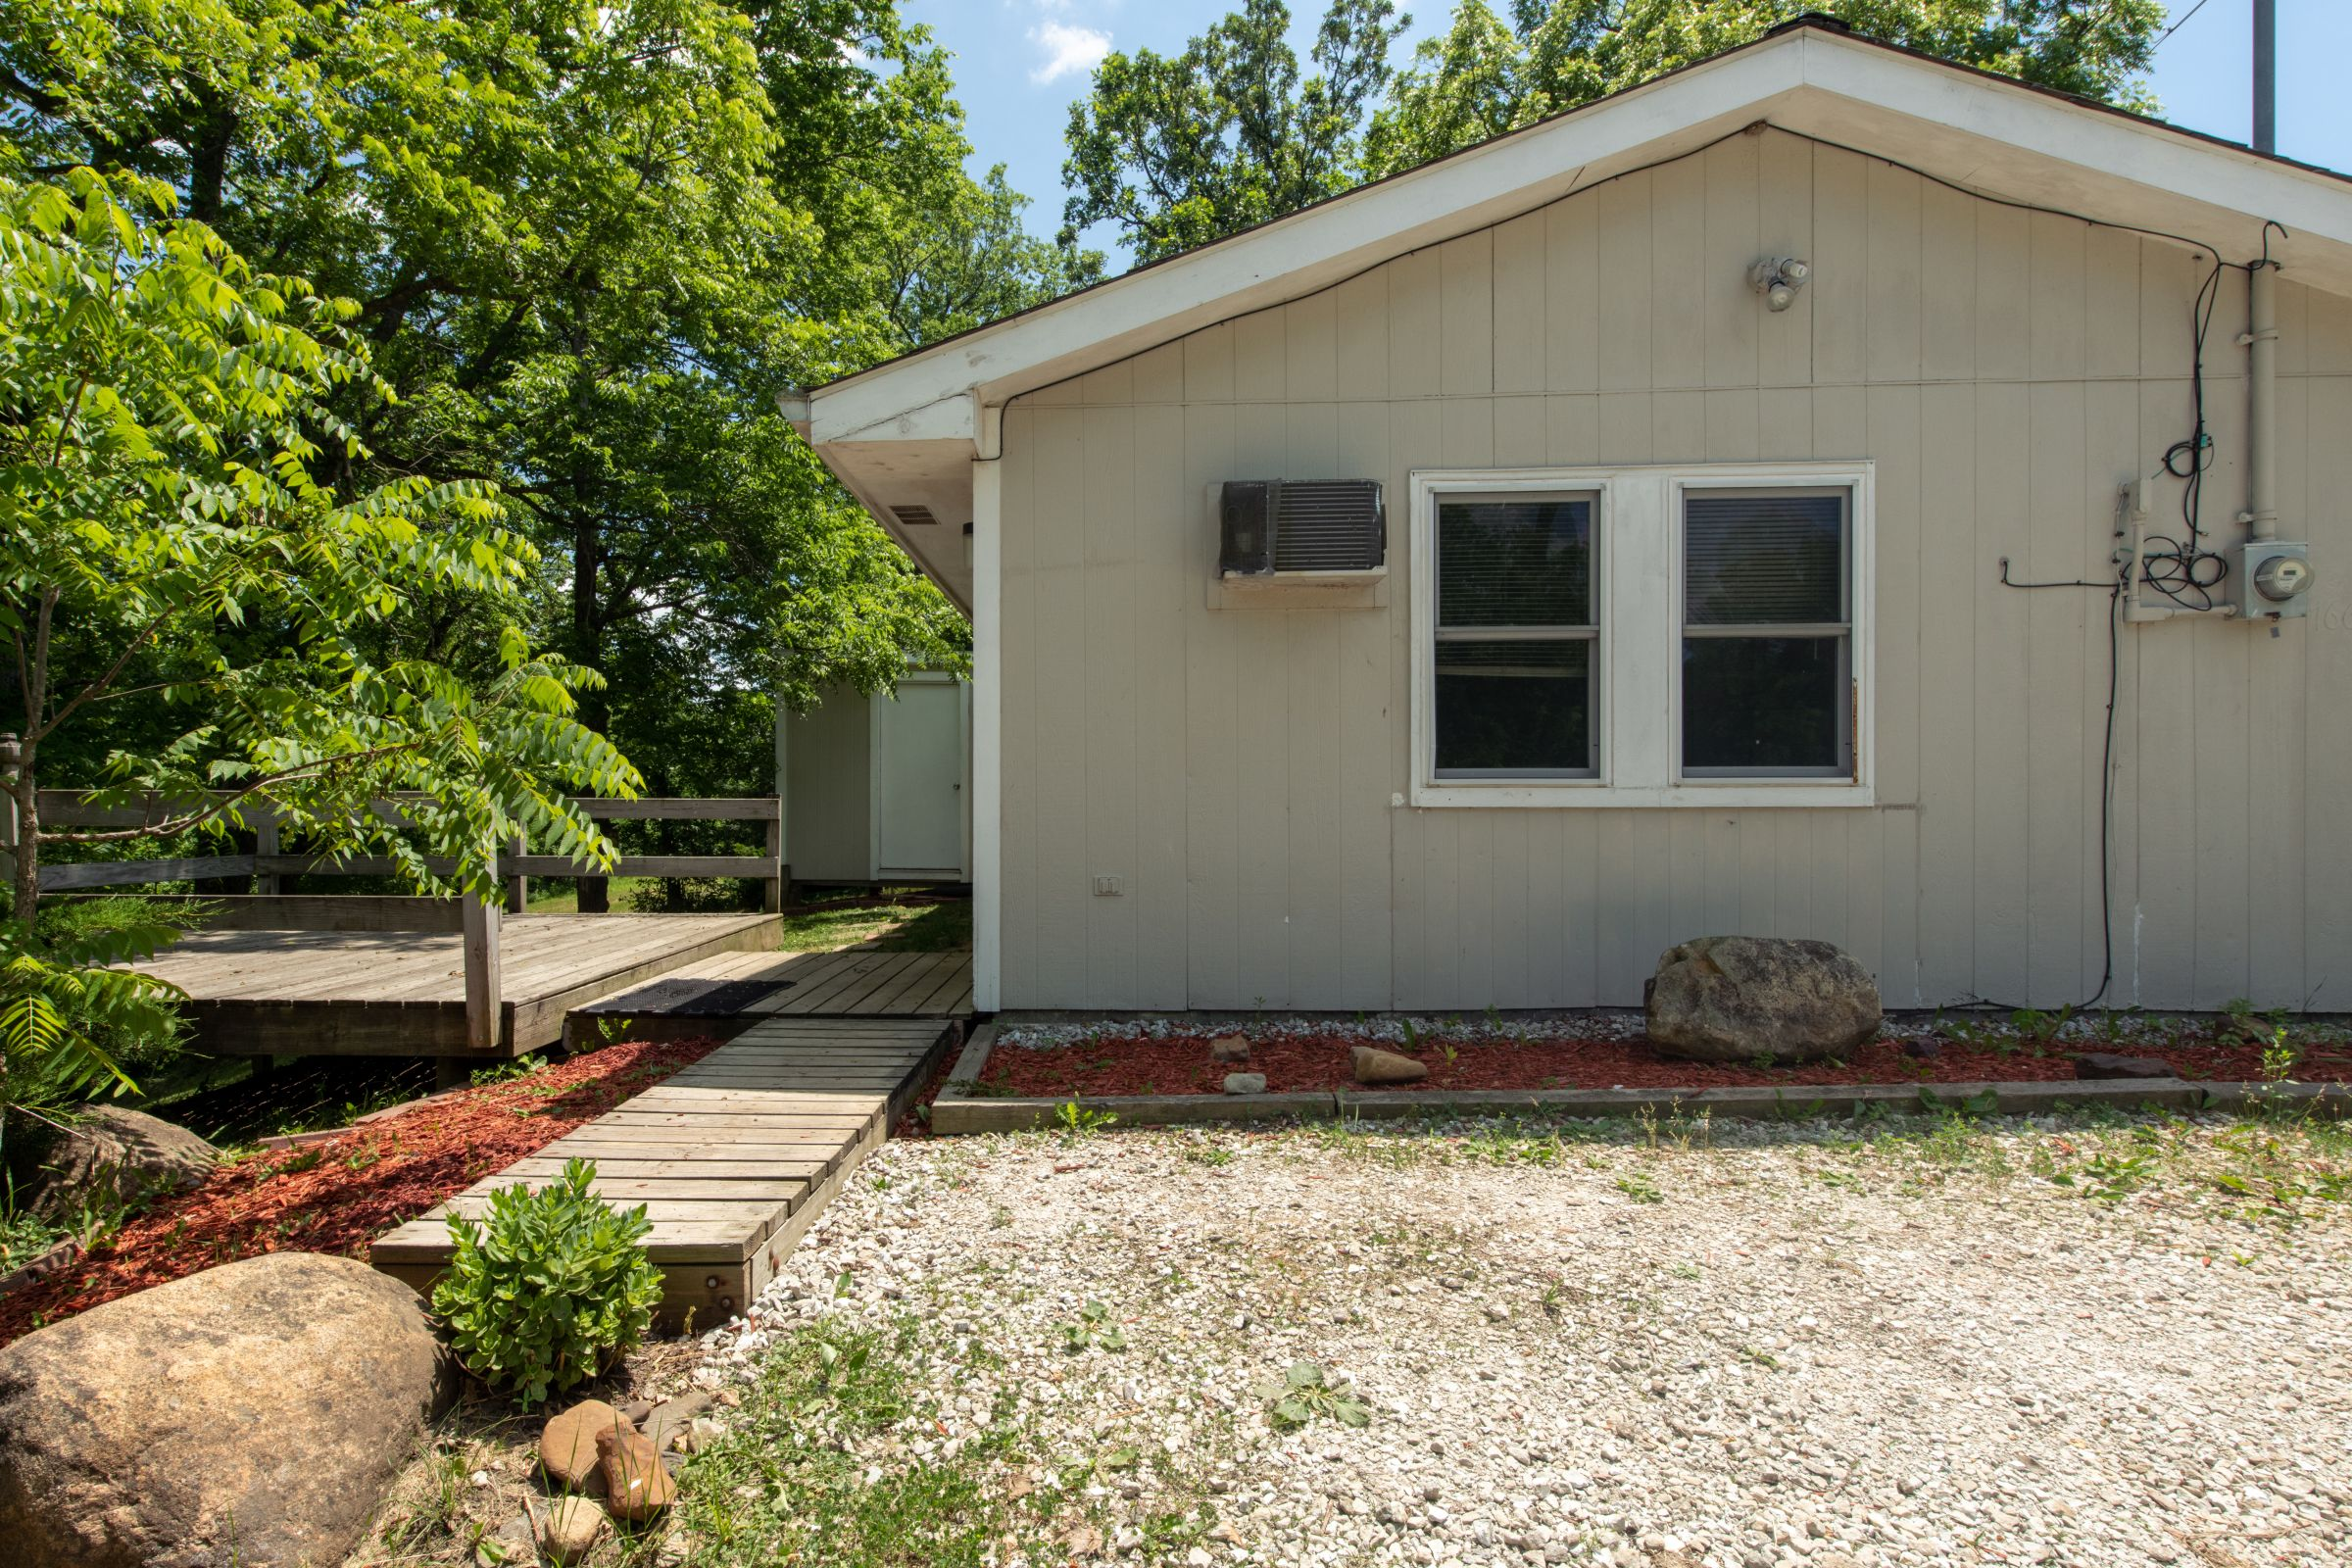 residential-warren-county-iowa-2-acres-listing-number-15576-0-2021-06-11-201310.jpg